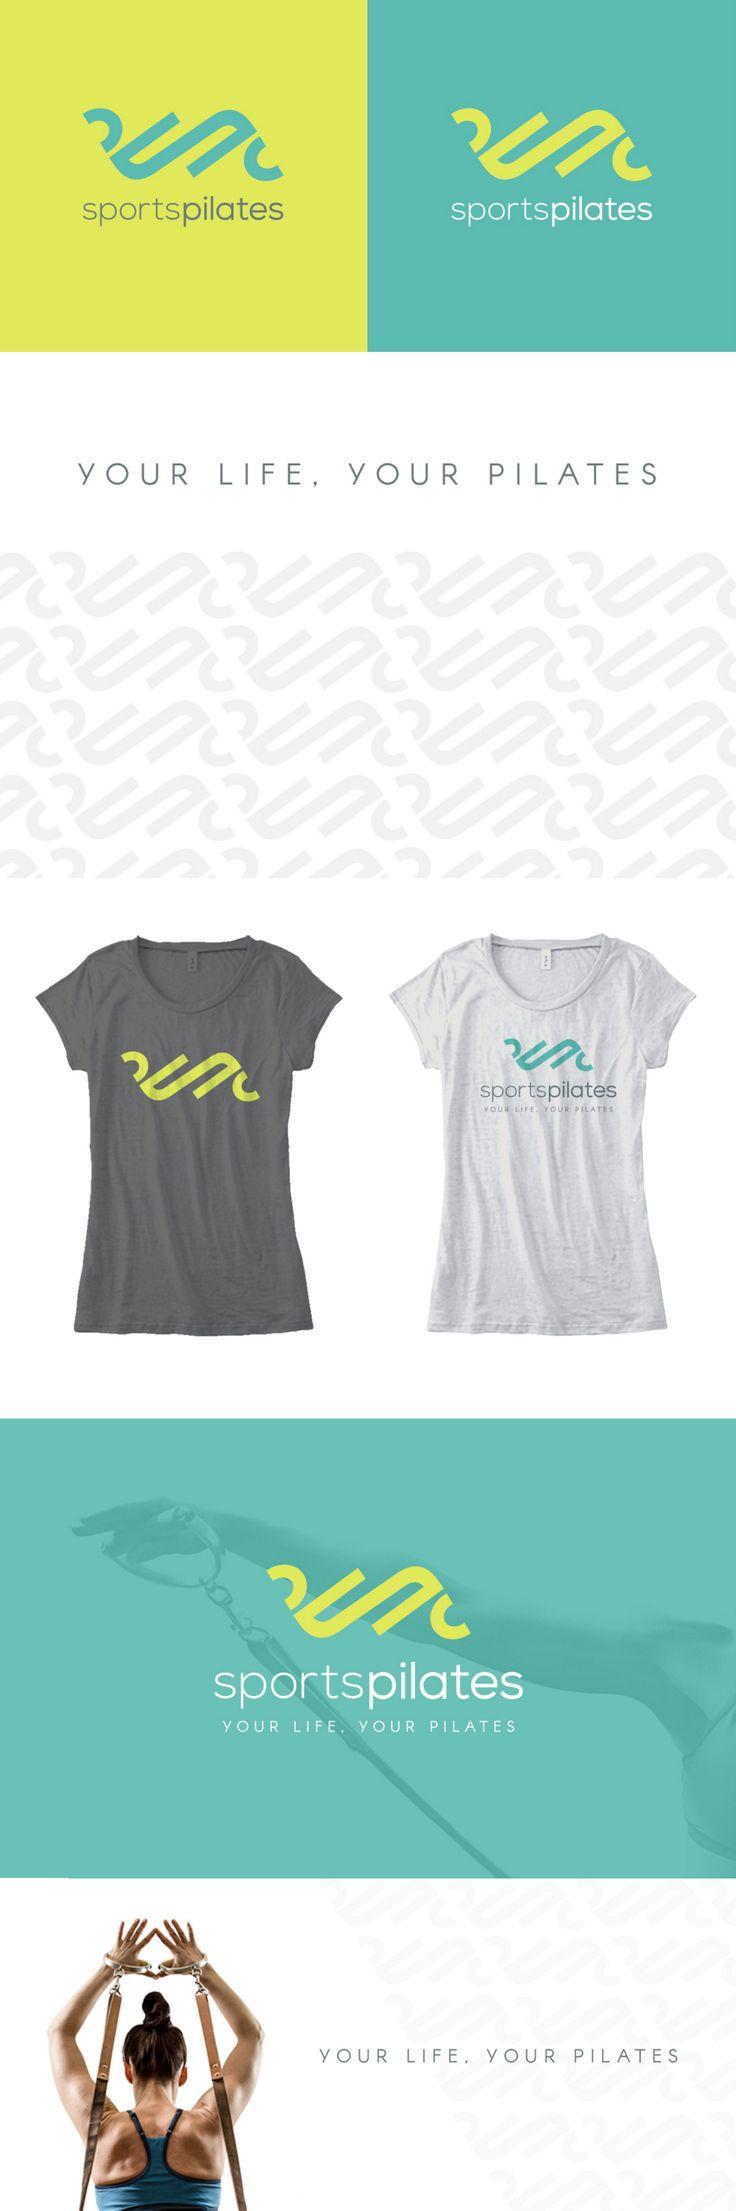 Logo, pattern design, branding, tshirt design, tagline creation for Pilates Studio in Sweden.